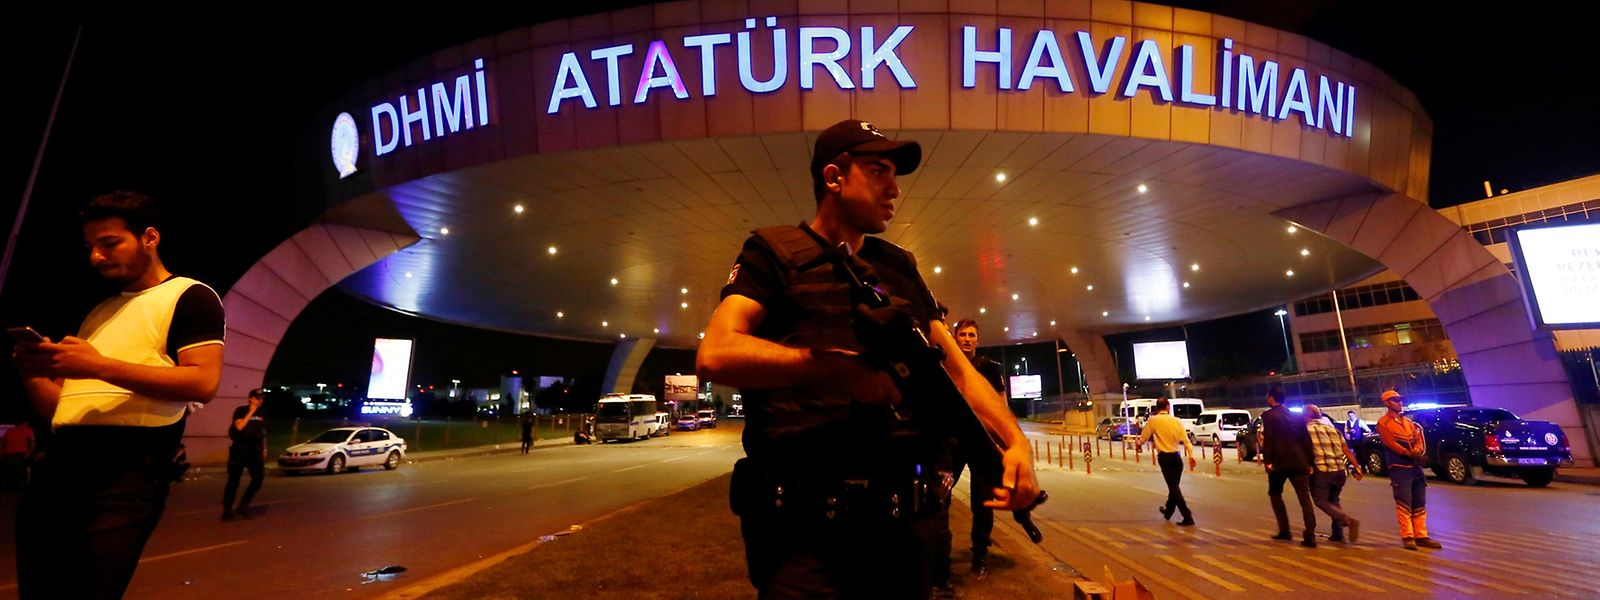 Polizisten sperren Eingang des Atatürk-Flughafens in Istanbul ab.